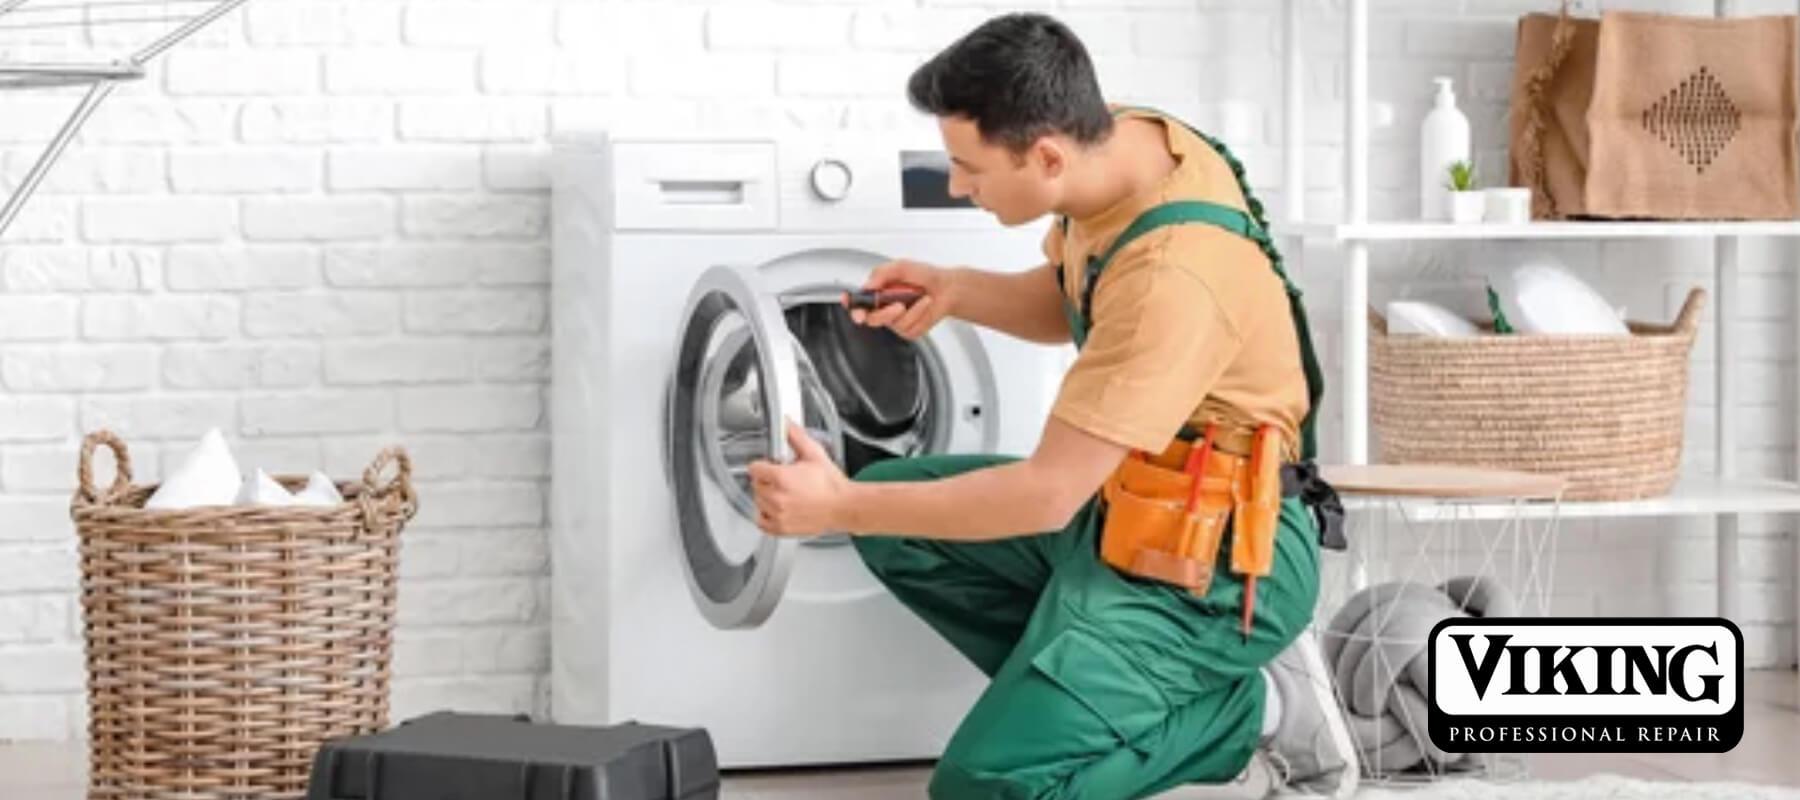 Authorized Viking Appliance Repair Service Santa Monica   Professional Viking Repair